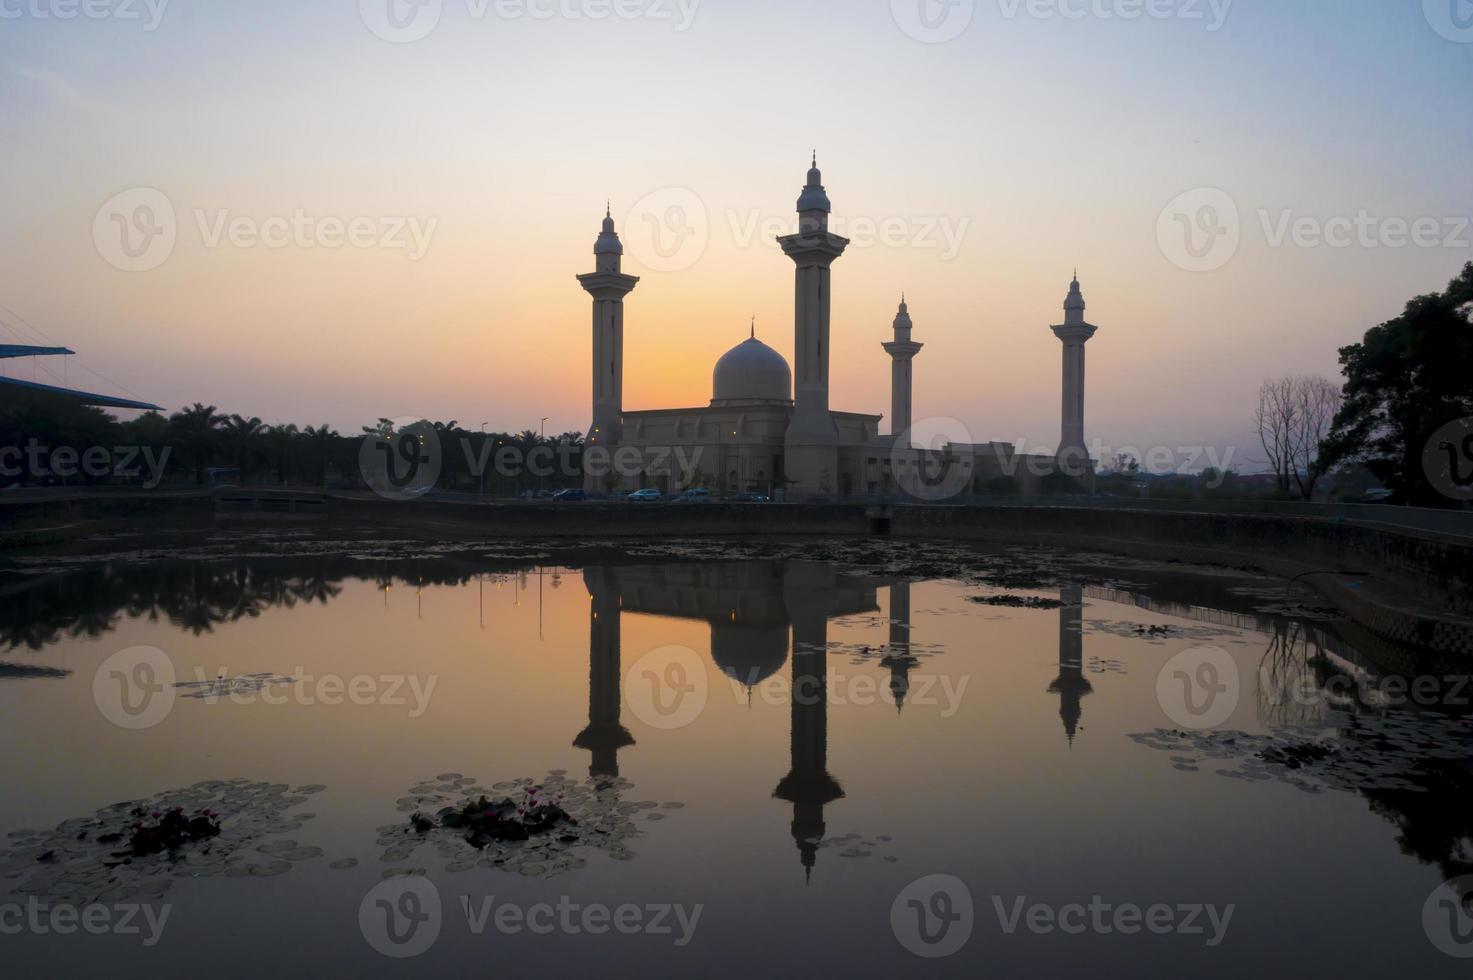 moskén vid soluppgången foto